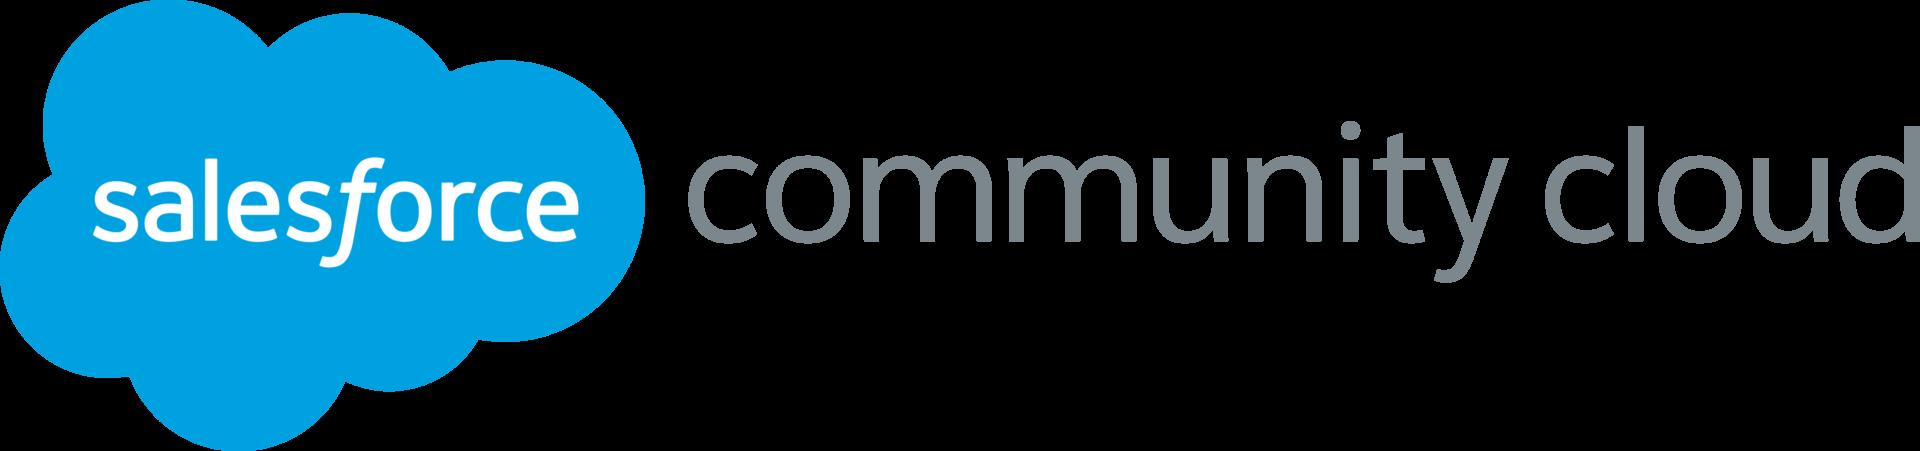 salesforceCommunityCloud